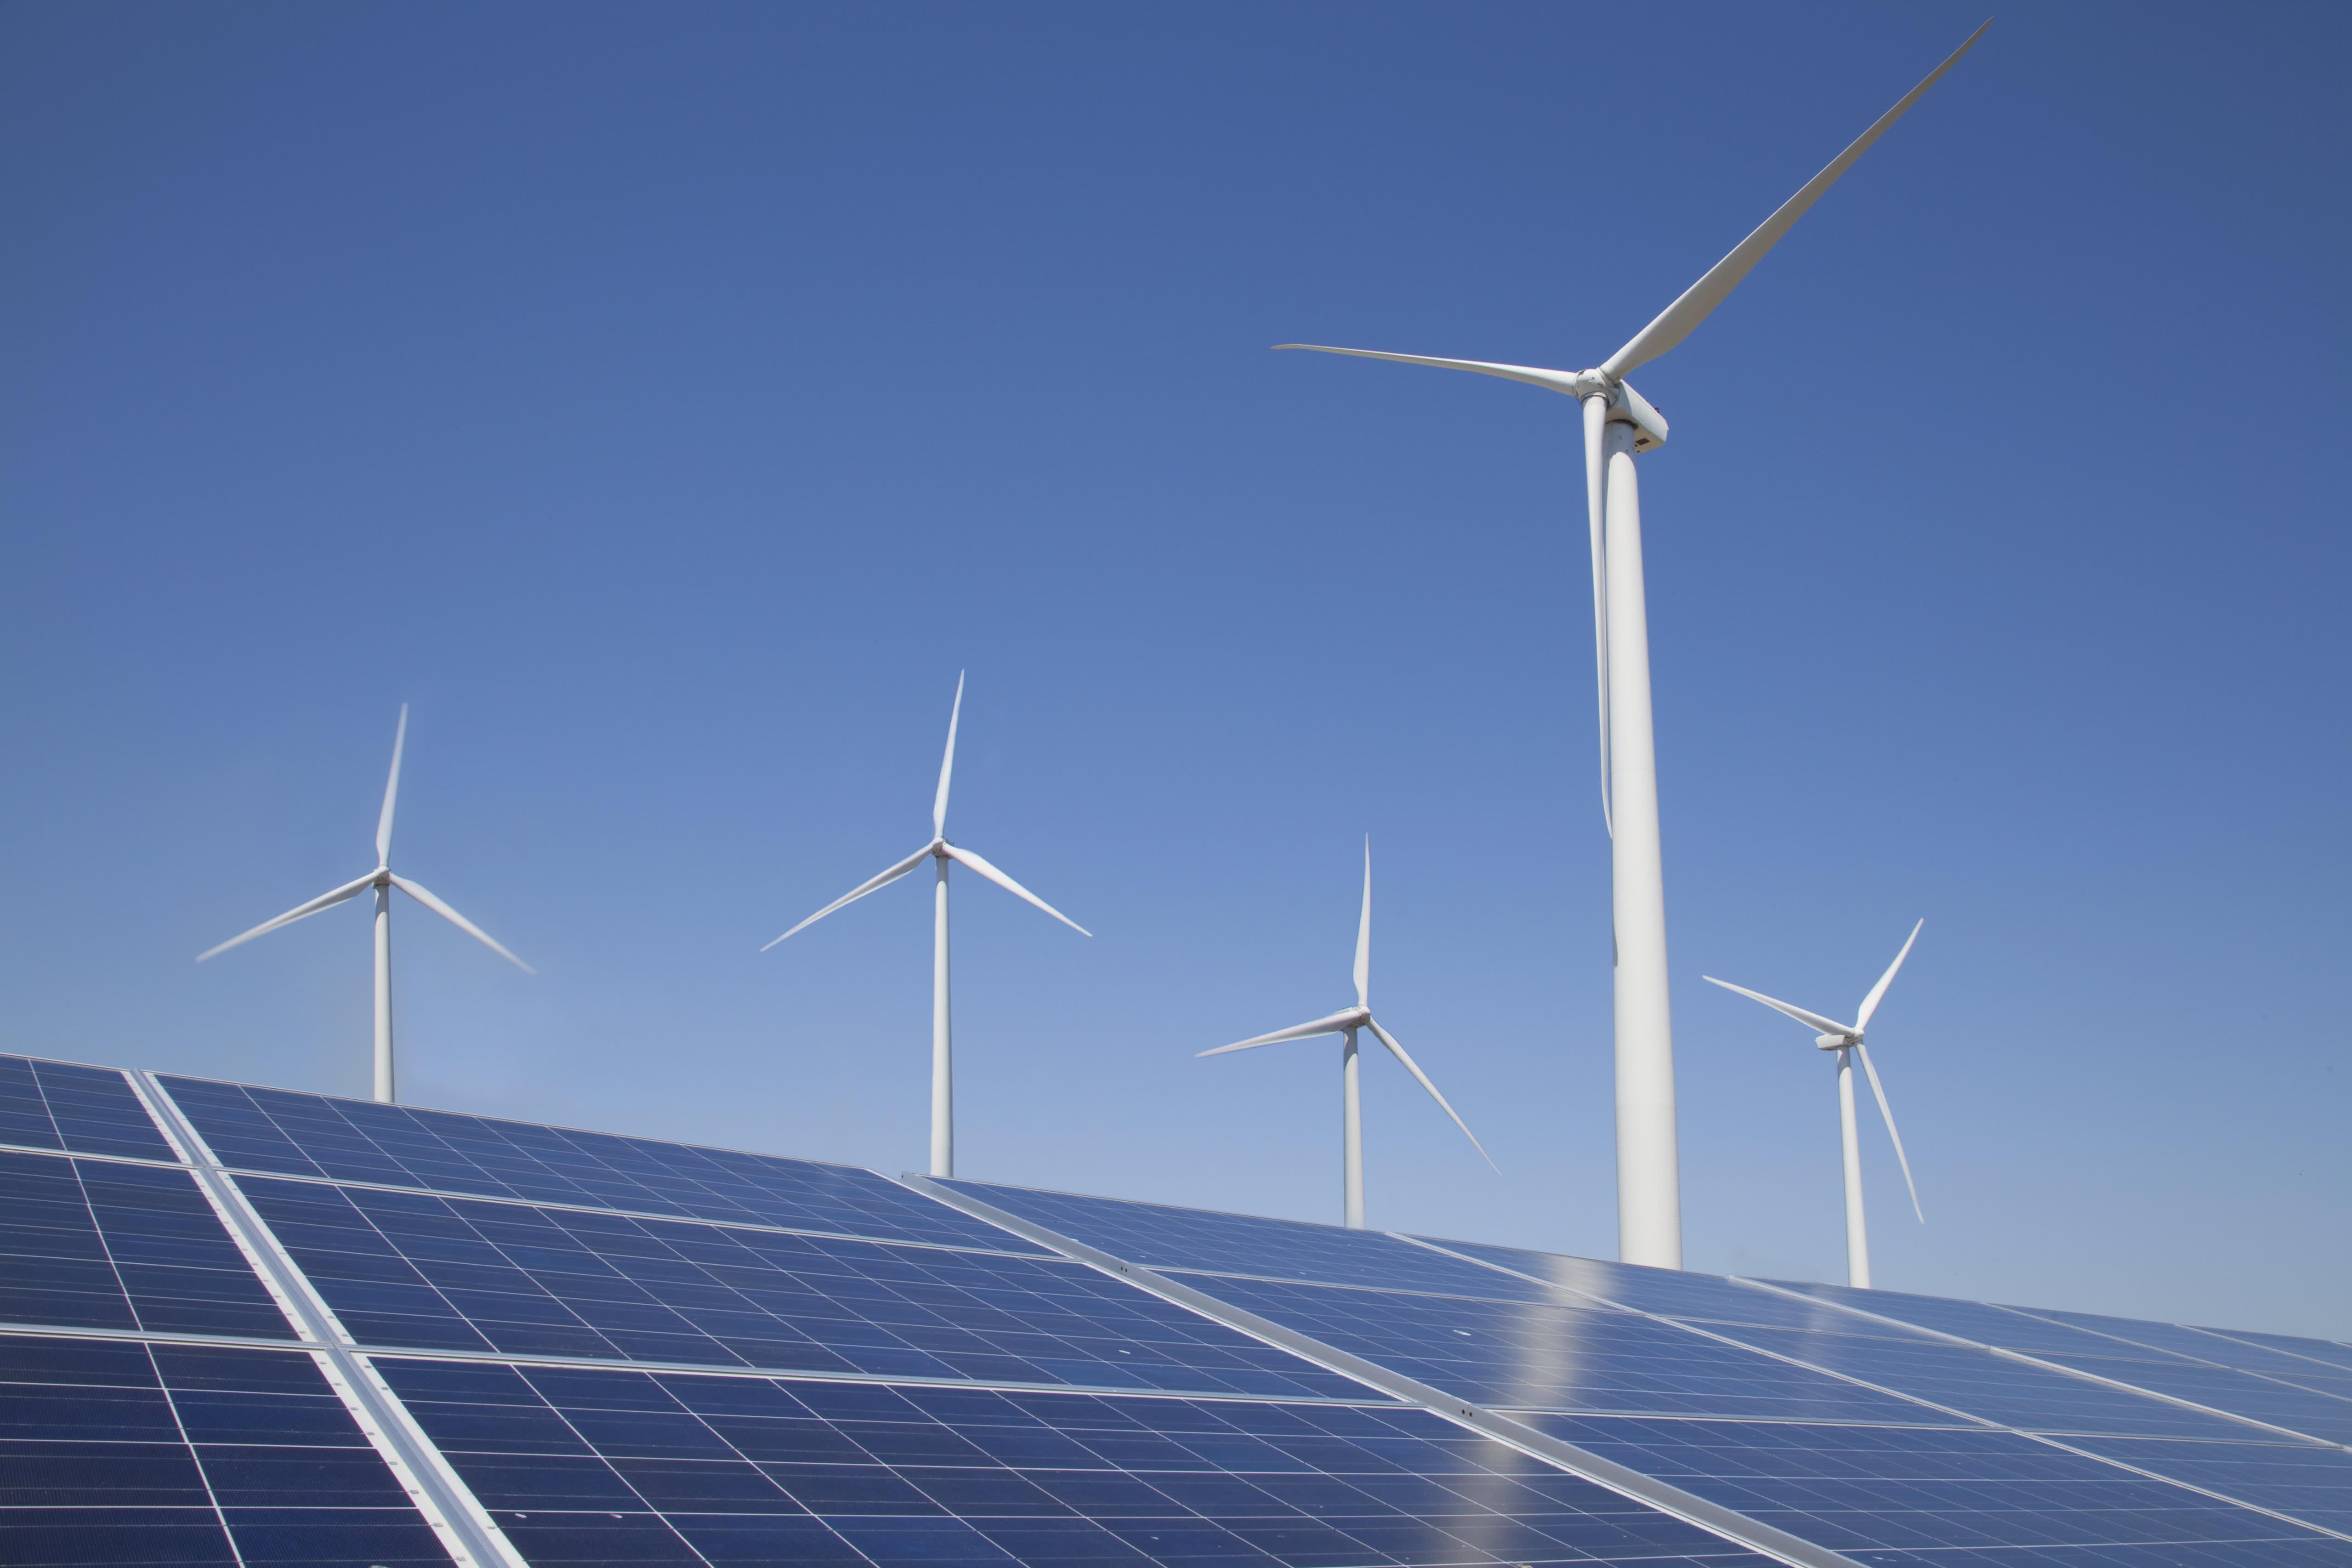 Jim Cramer: Three solar stocks to play on a Biden presidential election victory